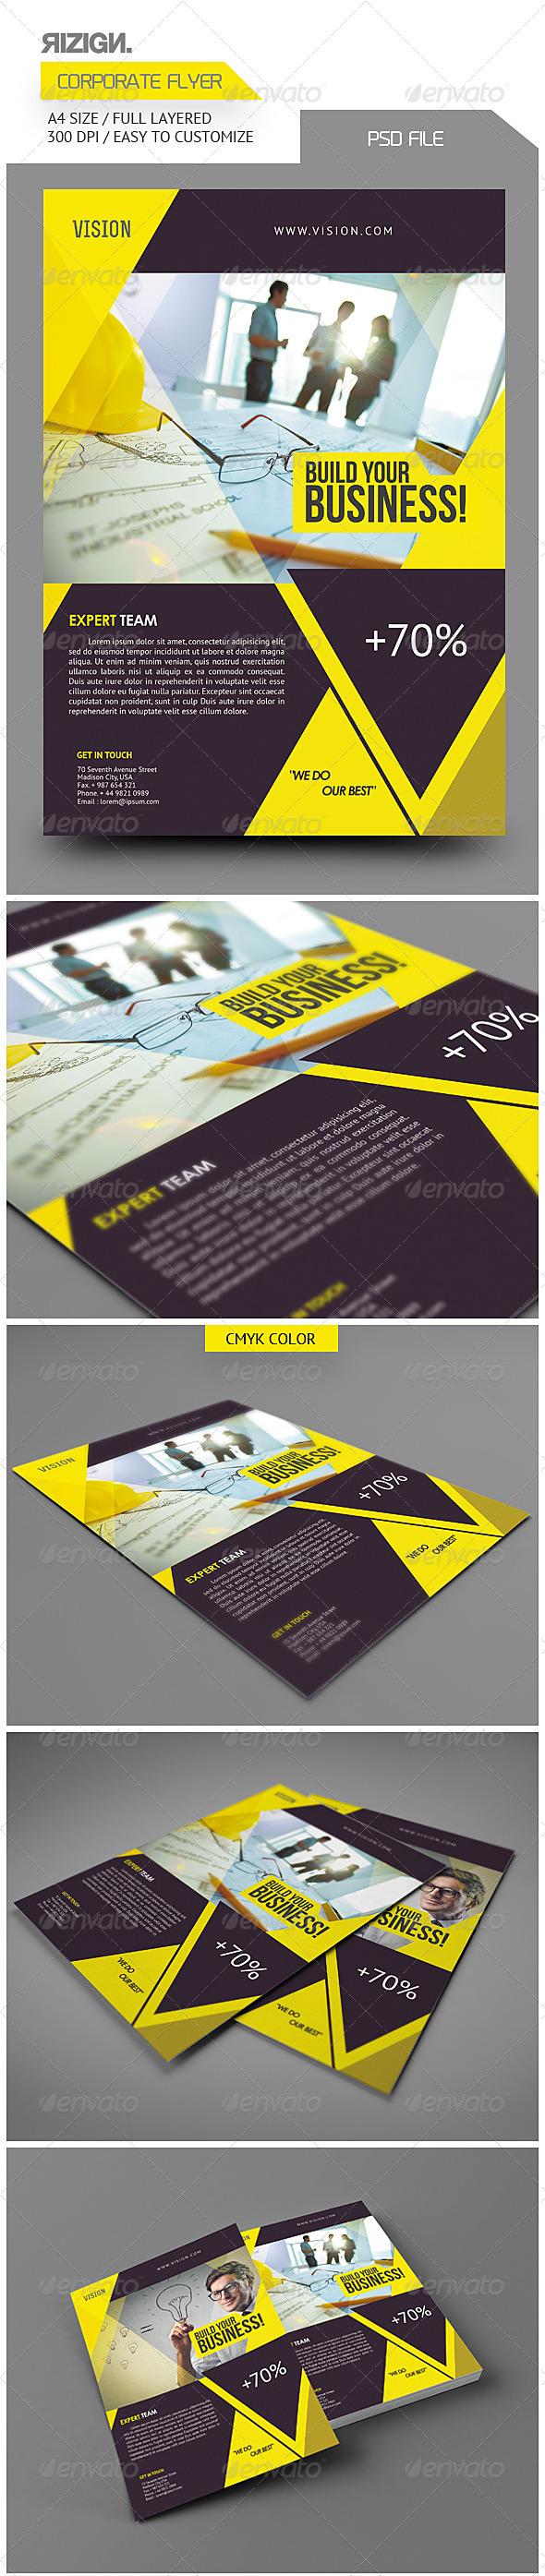 GraphicRiver Corporate Flyer 5684001